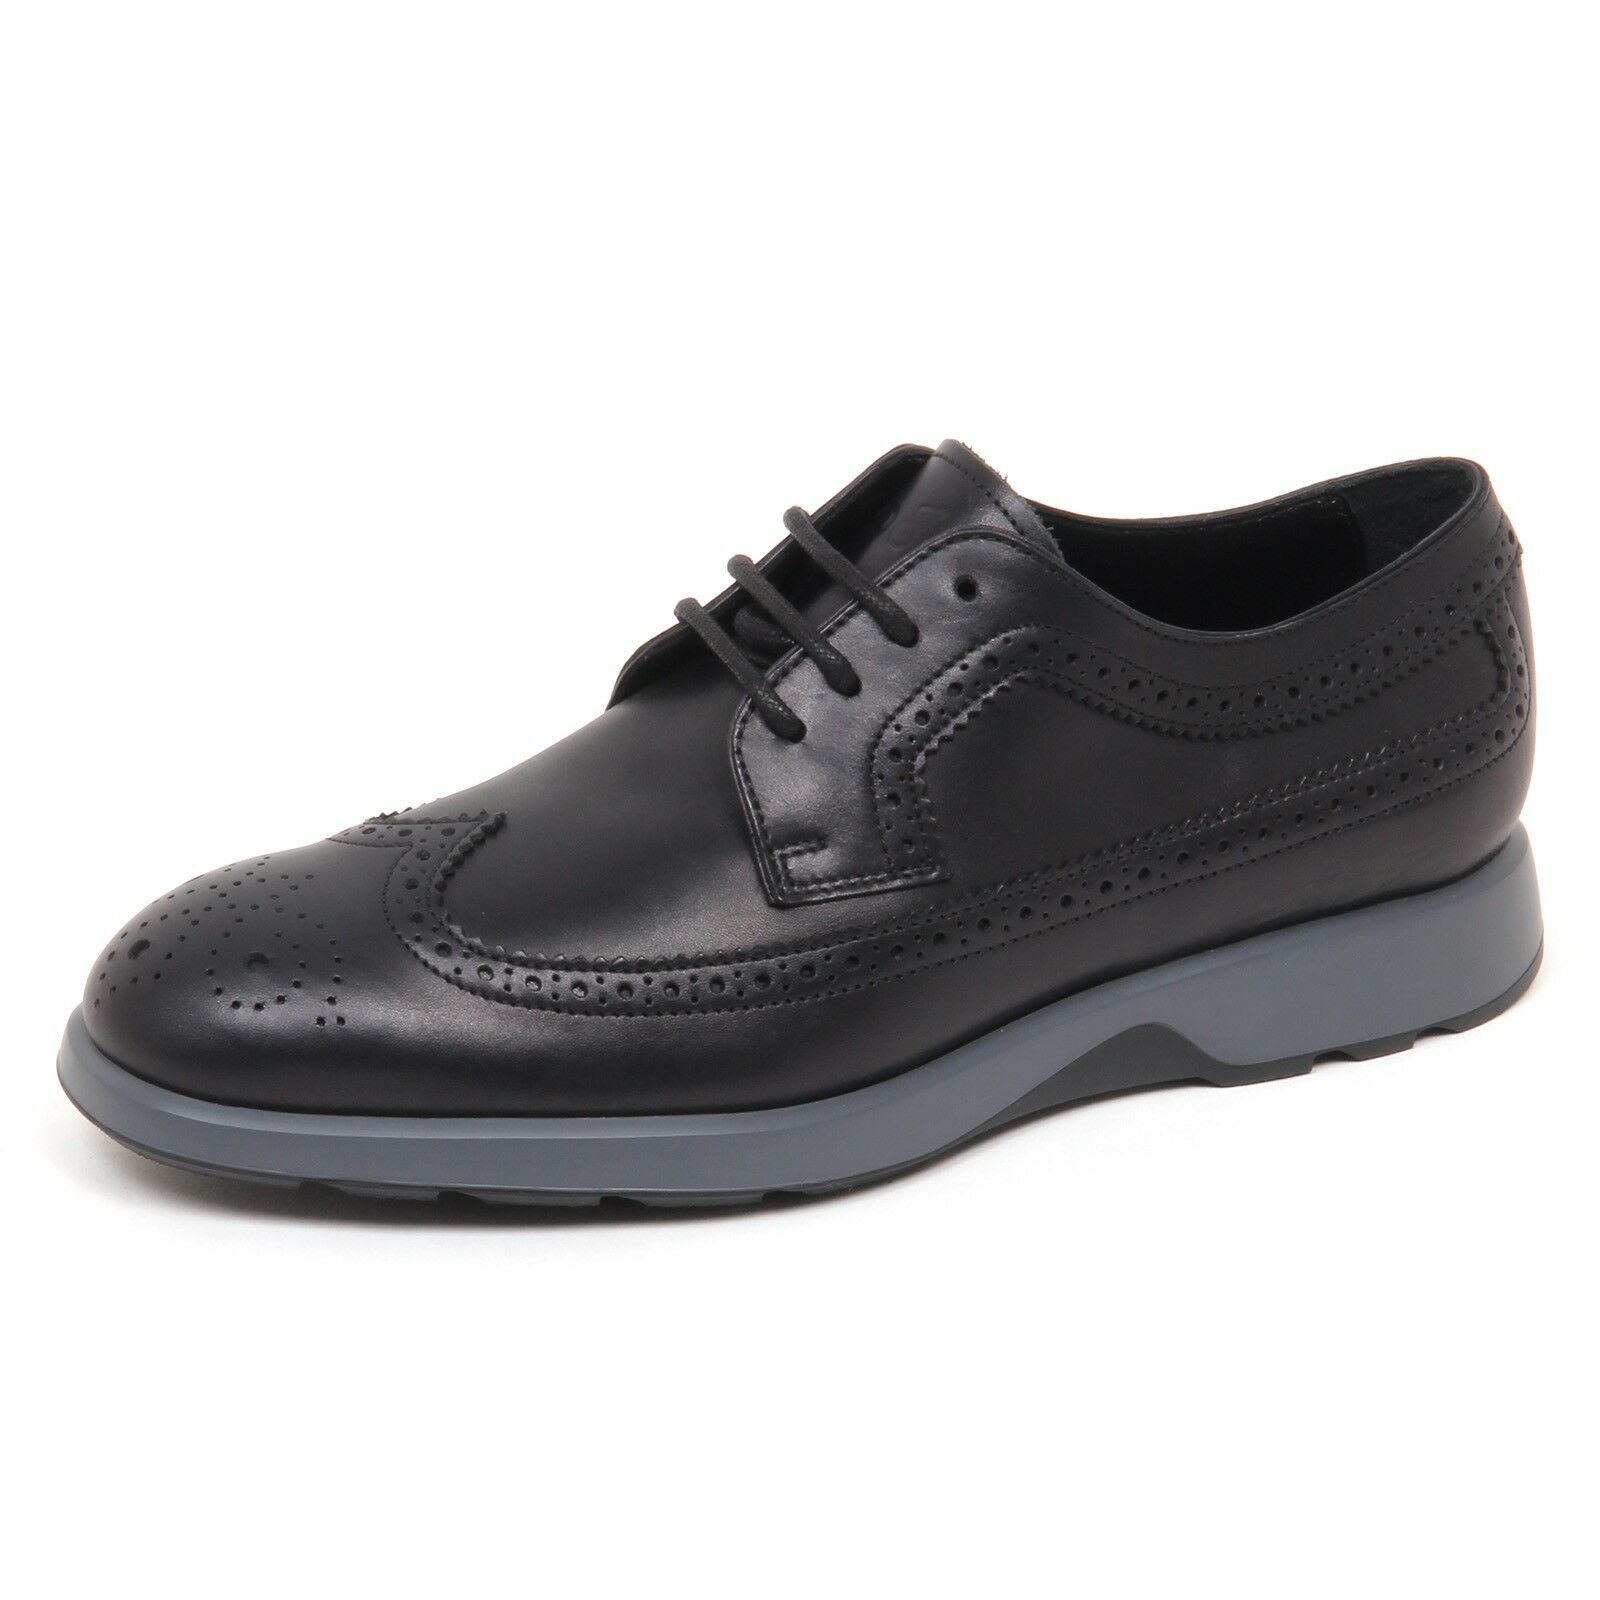 E0624 scarpa uomo nero HOGAN NEW DRESS X DERBY BUCATURE shoe man